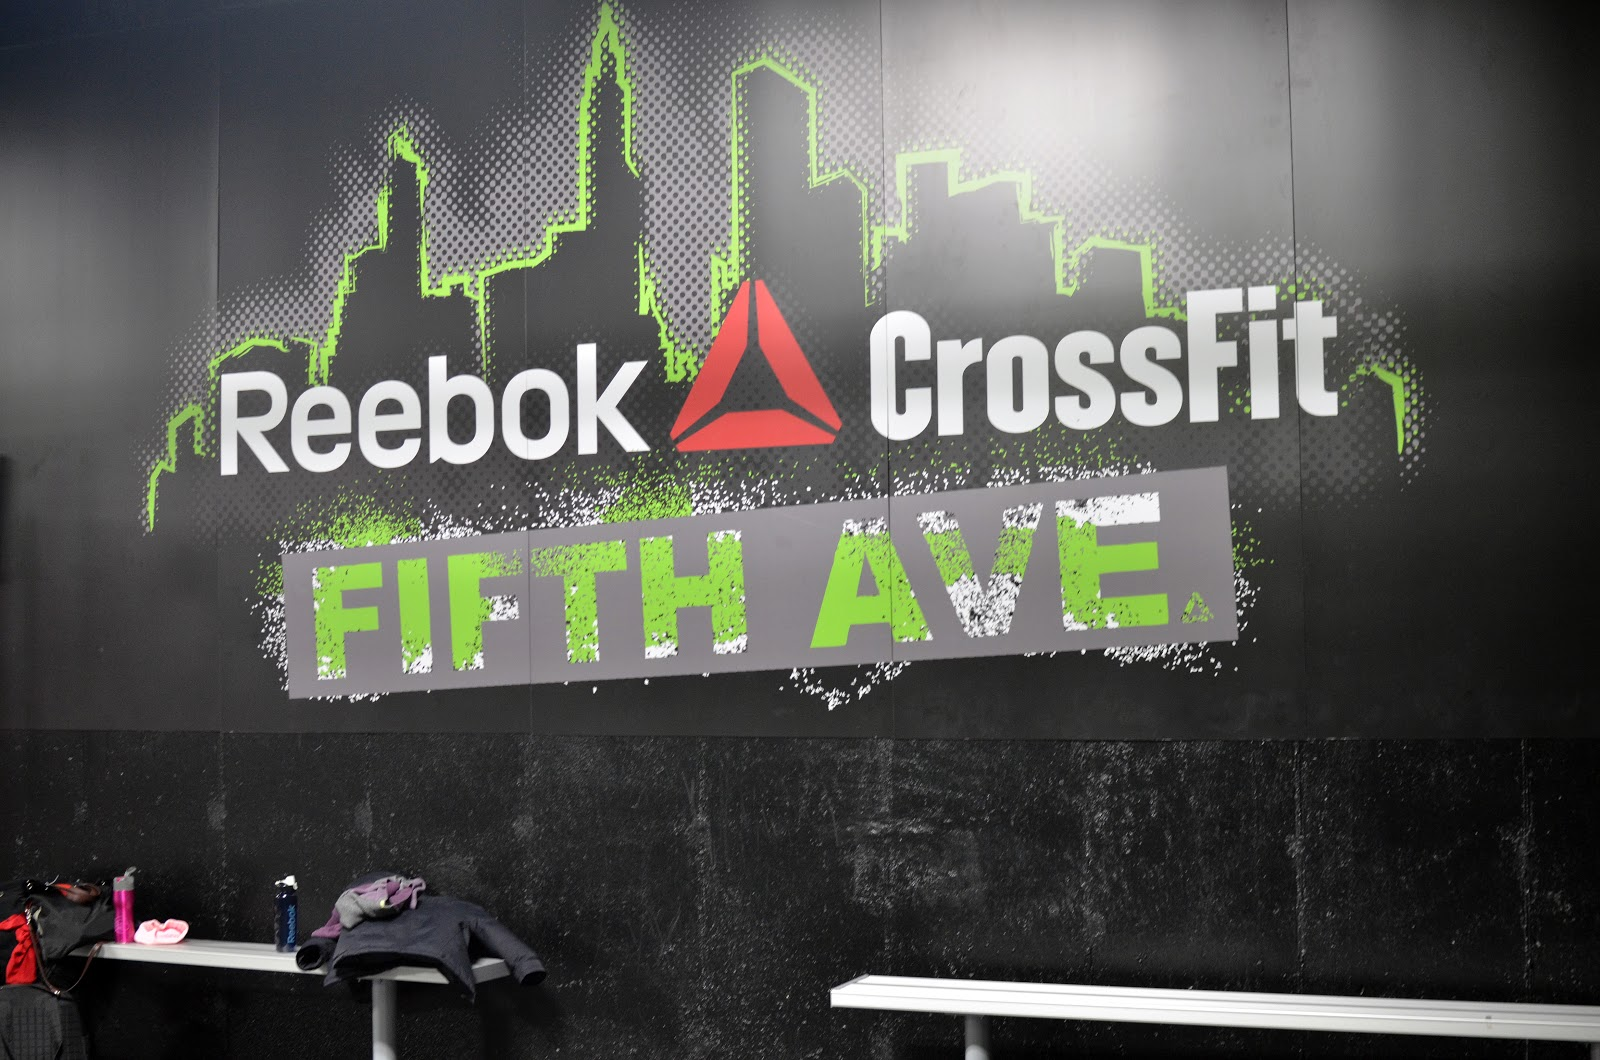 5th avenue reebok crossfit